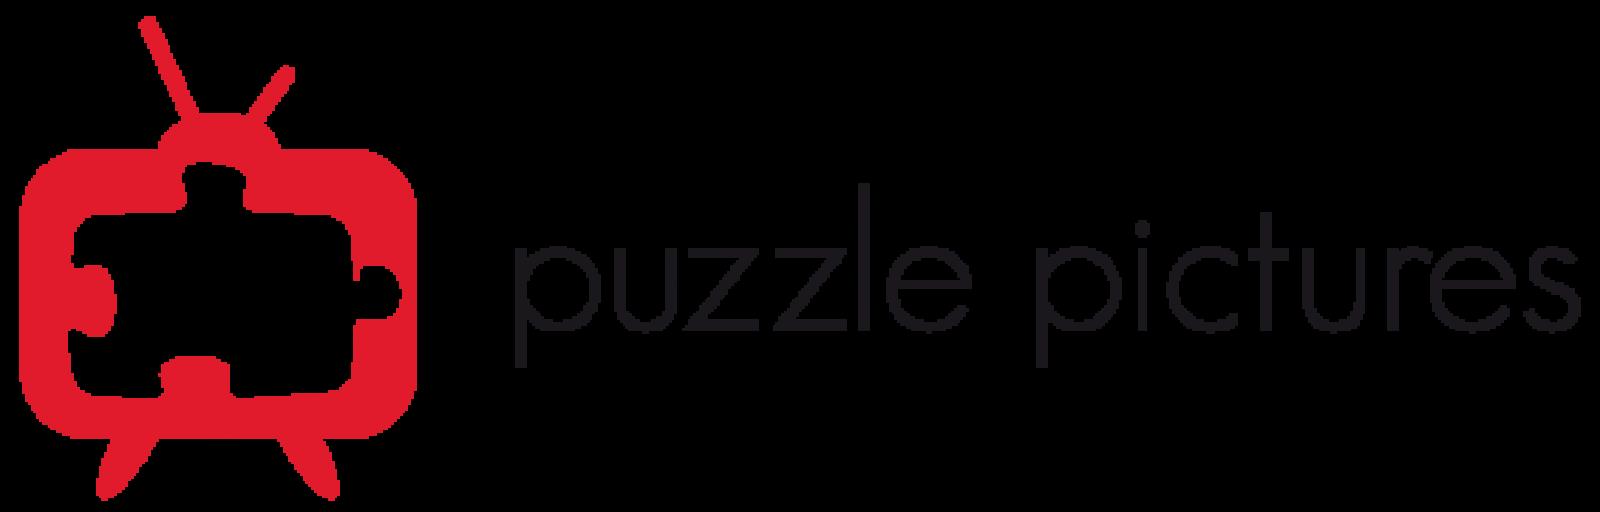 puzzle pictures